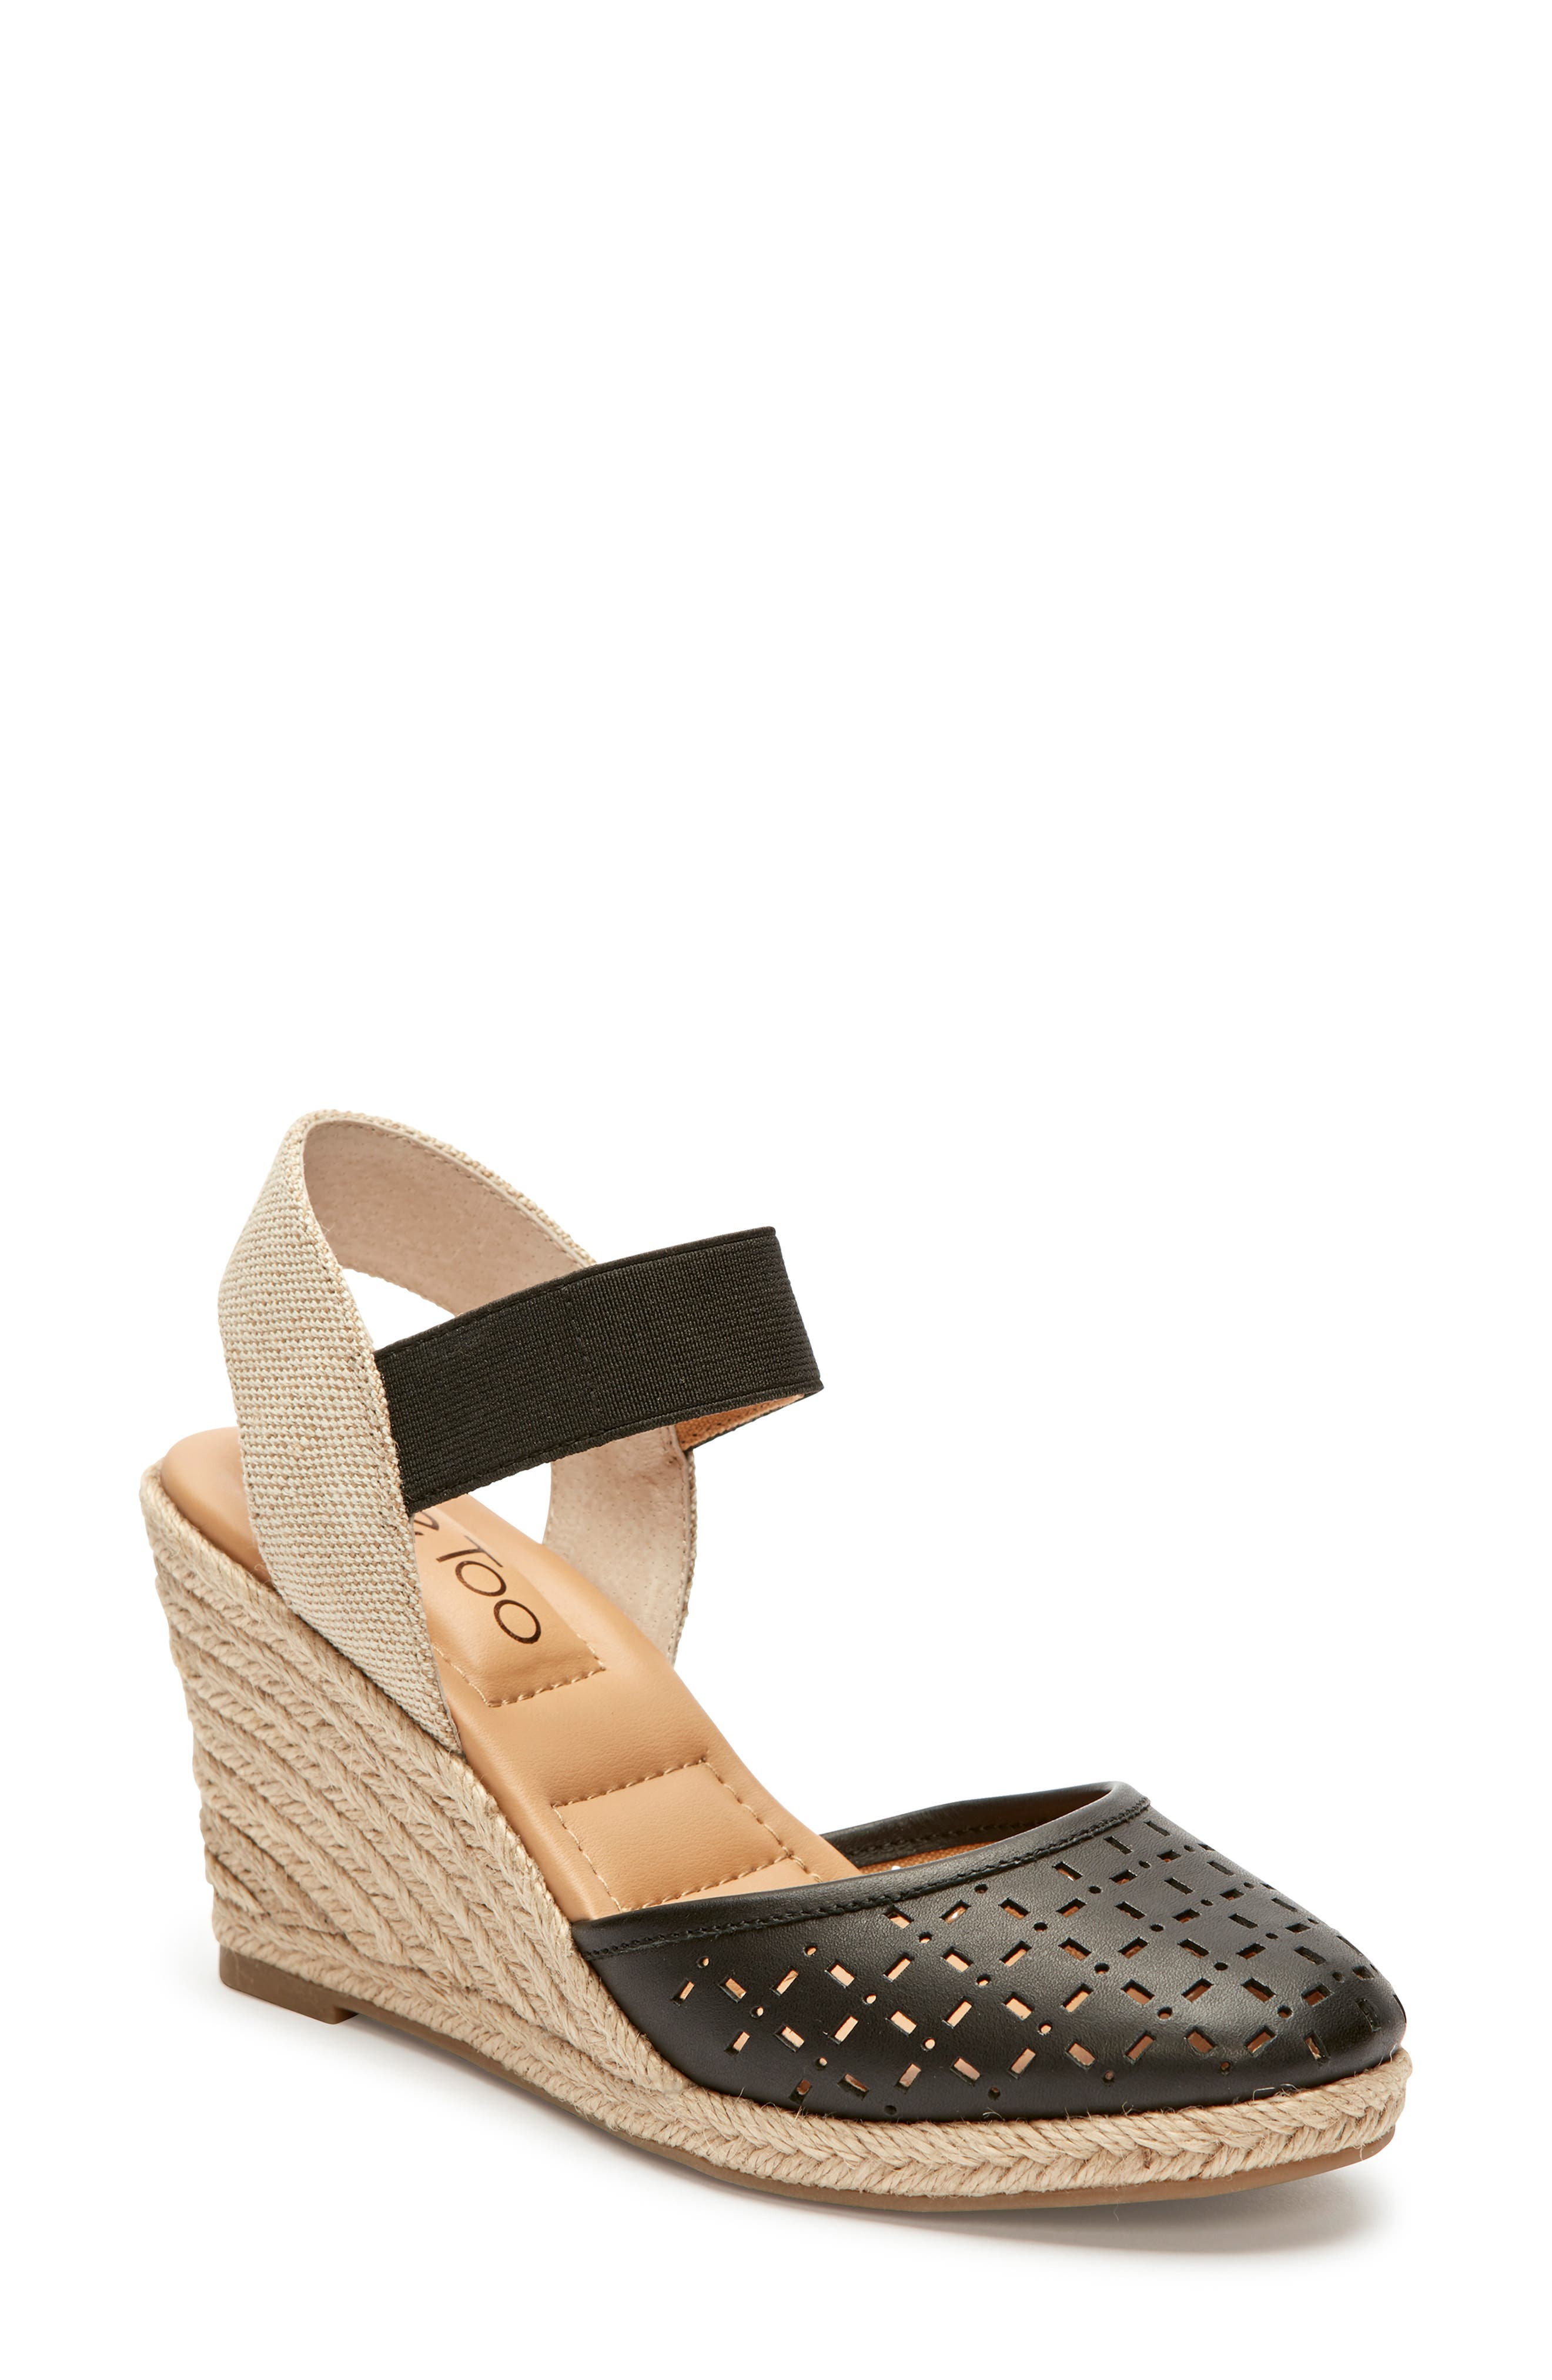 Me Too Bess Wedge Sandal- Black